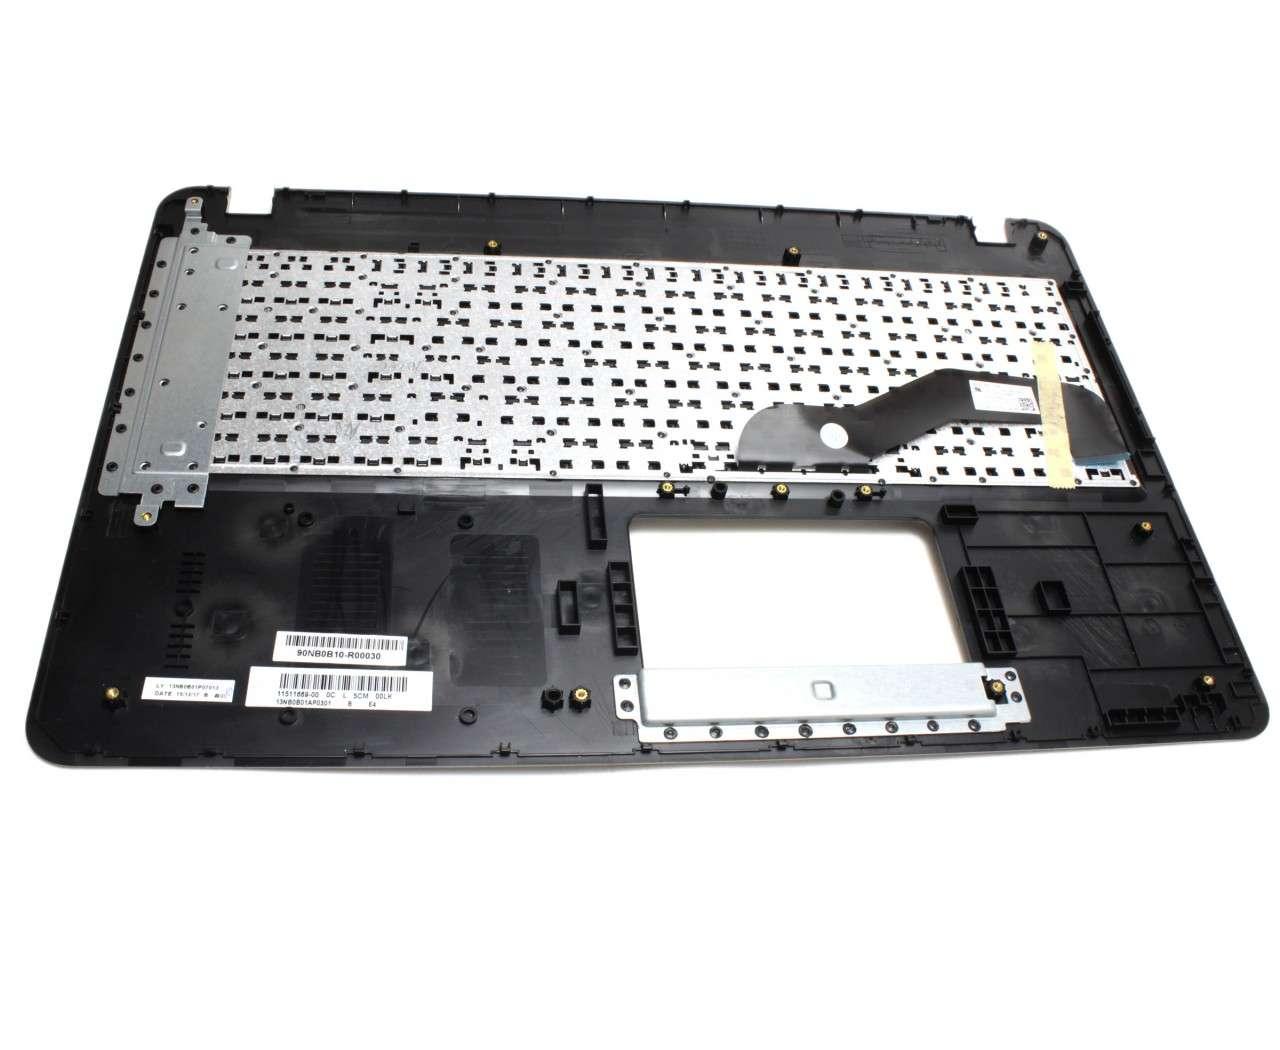 Tastatura Asus A540LJ neagra cu Palmrest auriu imagine powerlaptop.ro 2021